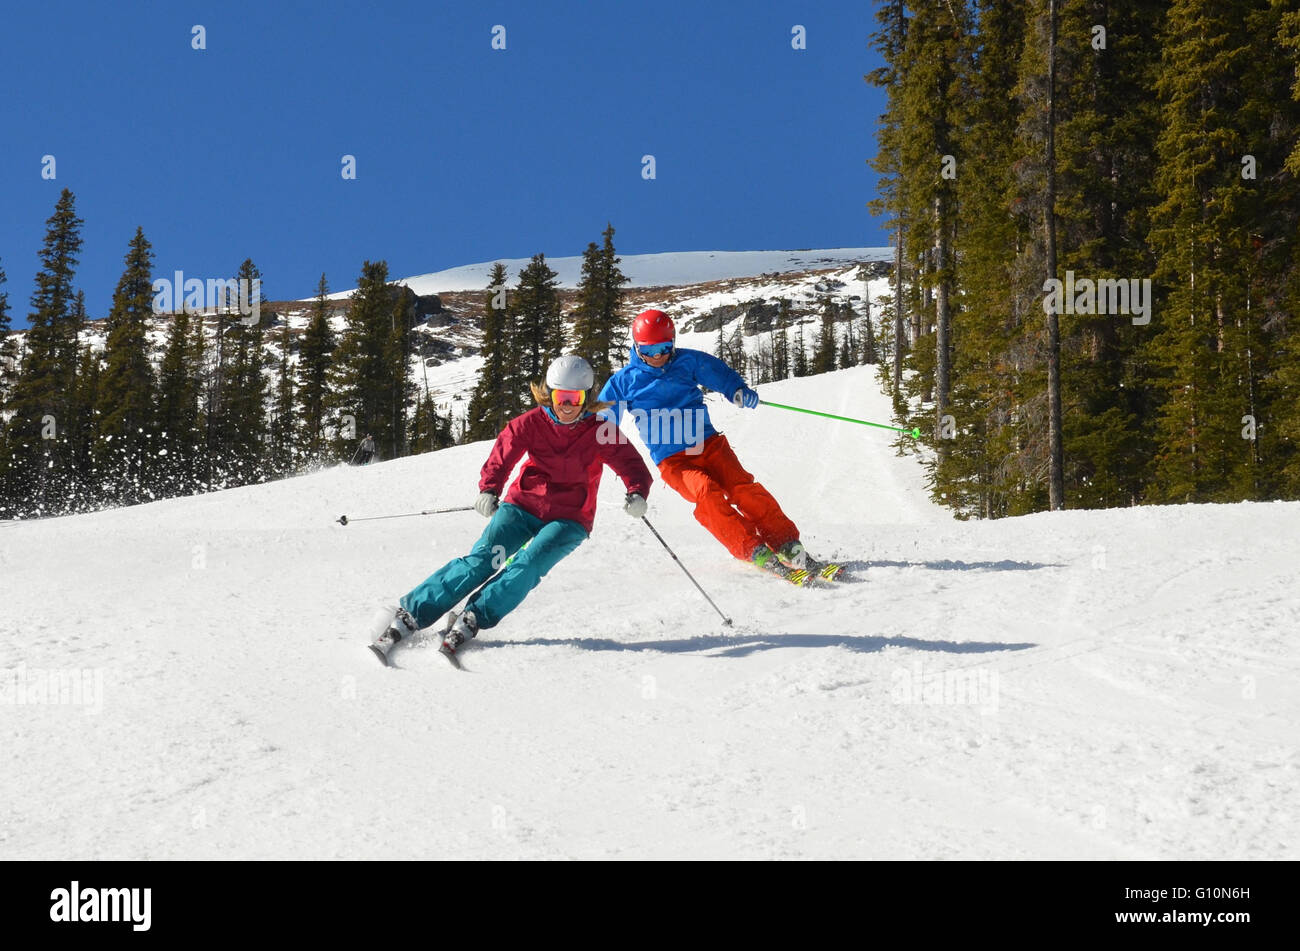 Skiing the Canadian Rockies, Alberta - Stock Image